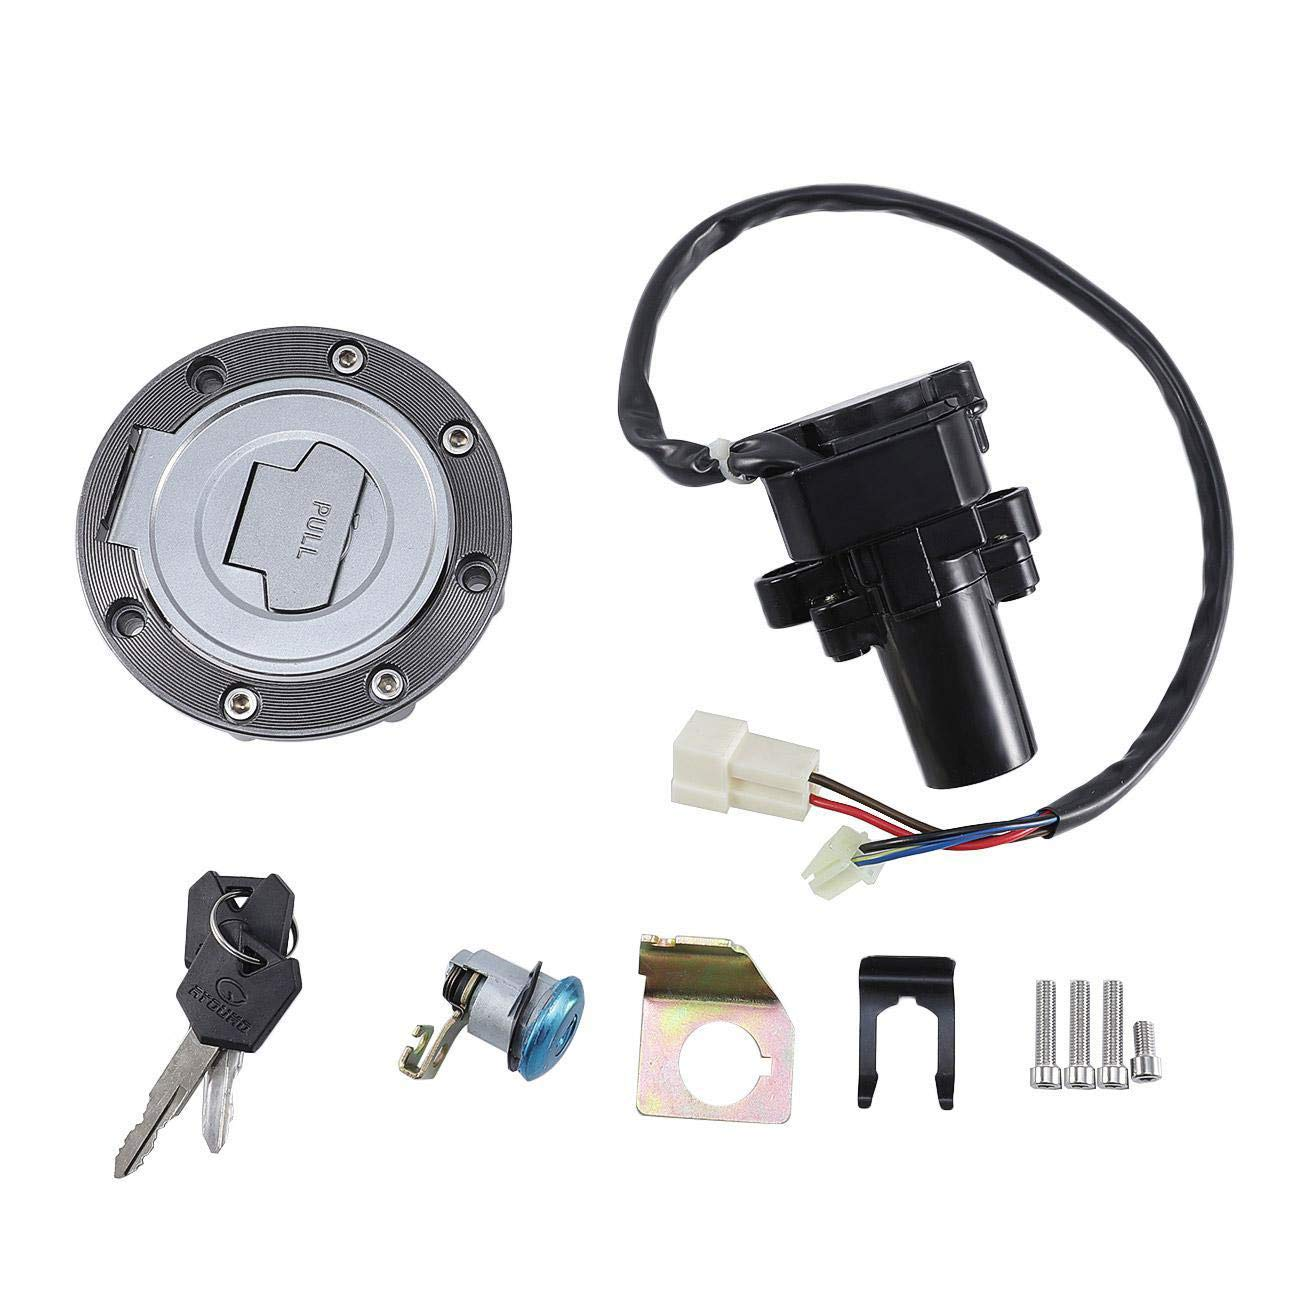 TOPAUP Ignition Switch Keys Lock Cylinder Yamaha Kit Gas Cap Cover Bracket FJR1300 2001-2005 YZF R6 2004 2006-2011 R6S FZ6 2004-2005